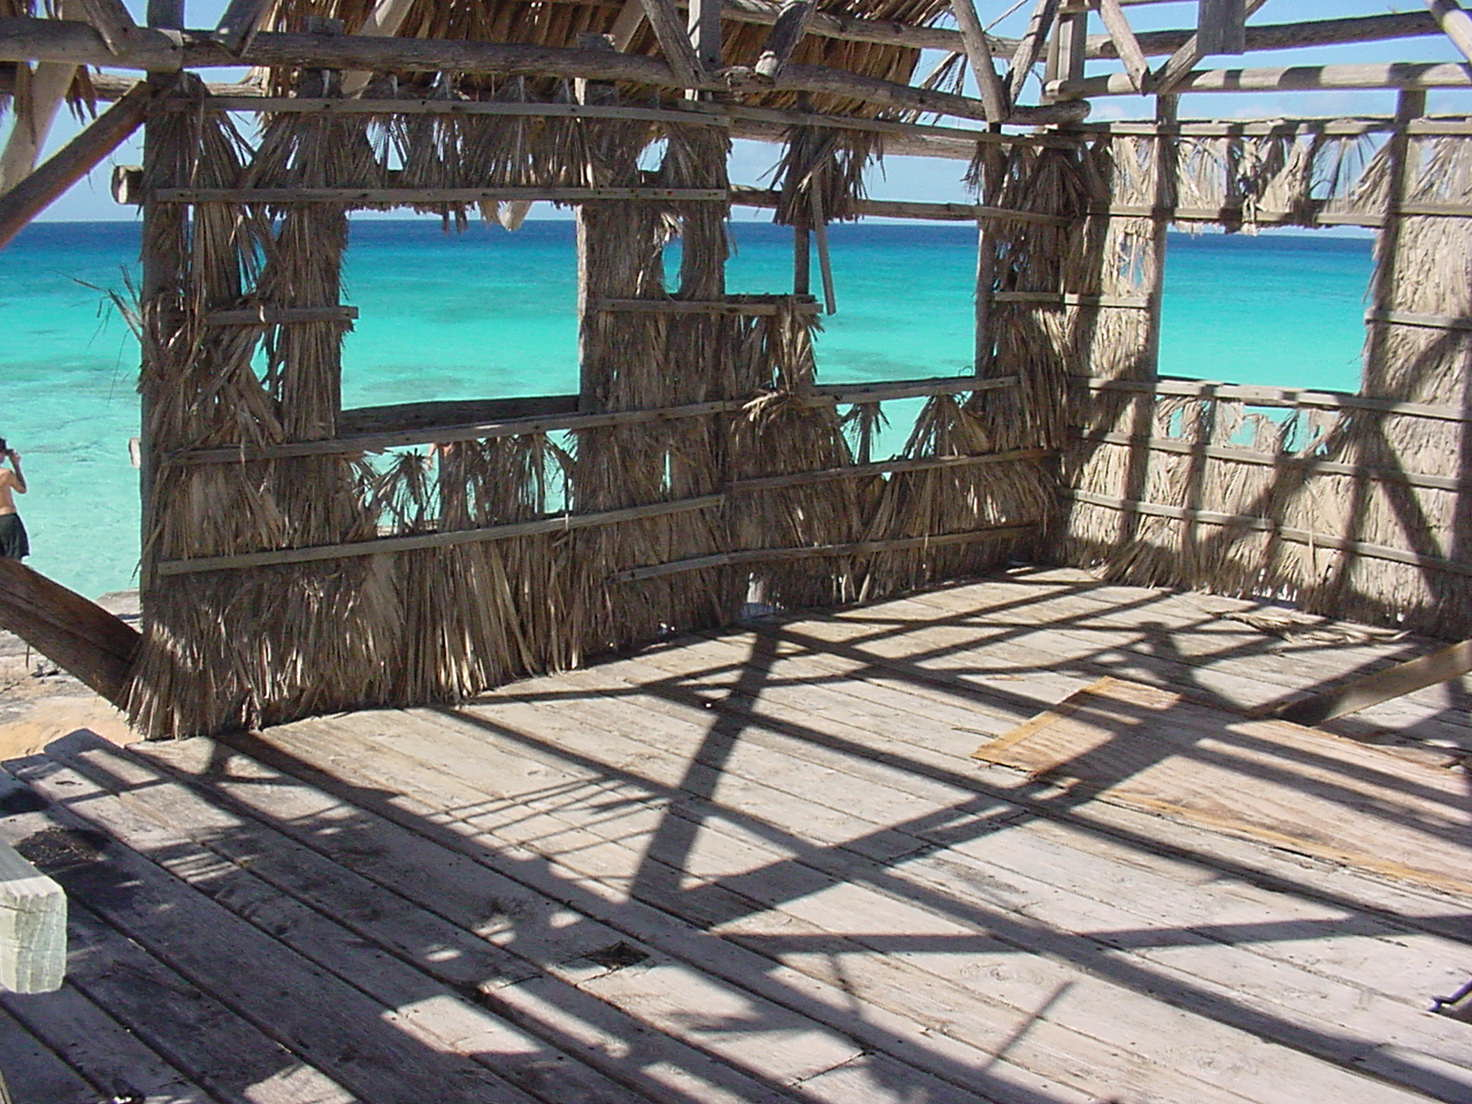 Rendez-vouz beach, Providenciales, Turks and Caicos